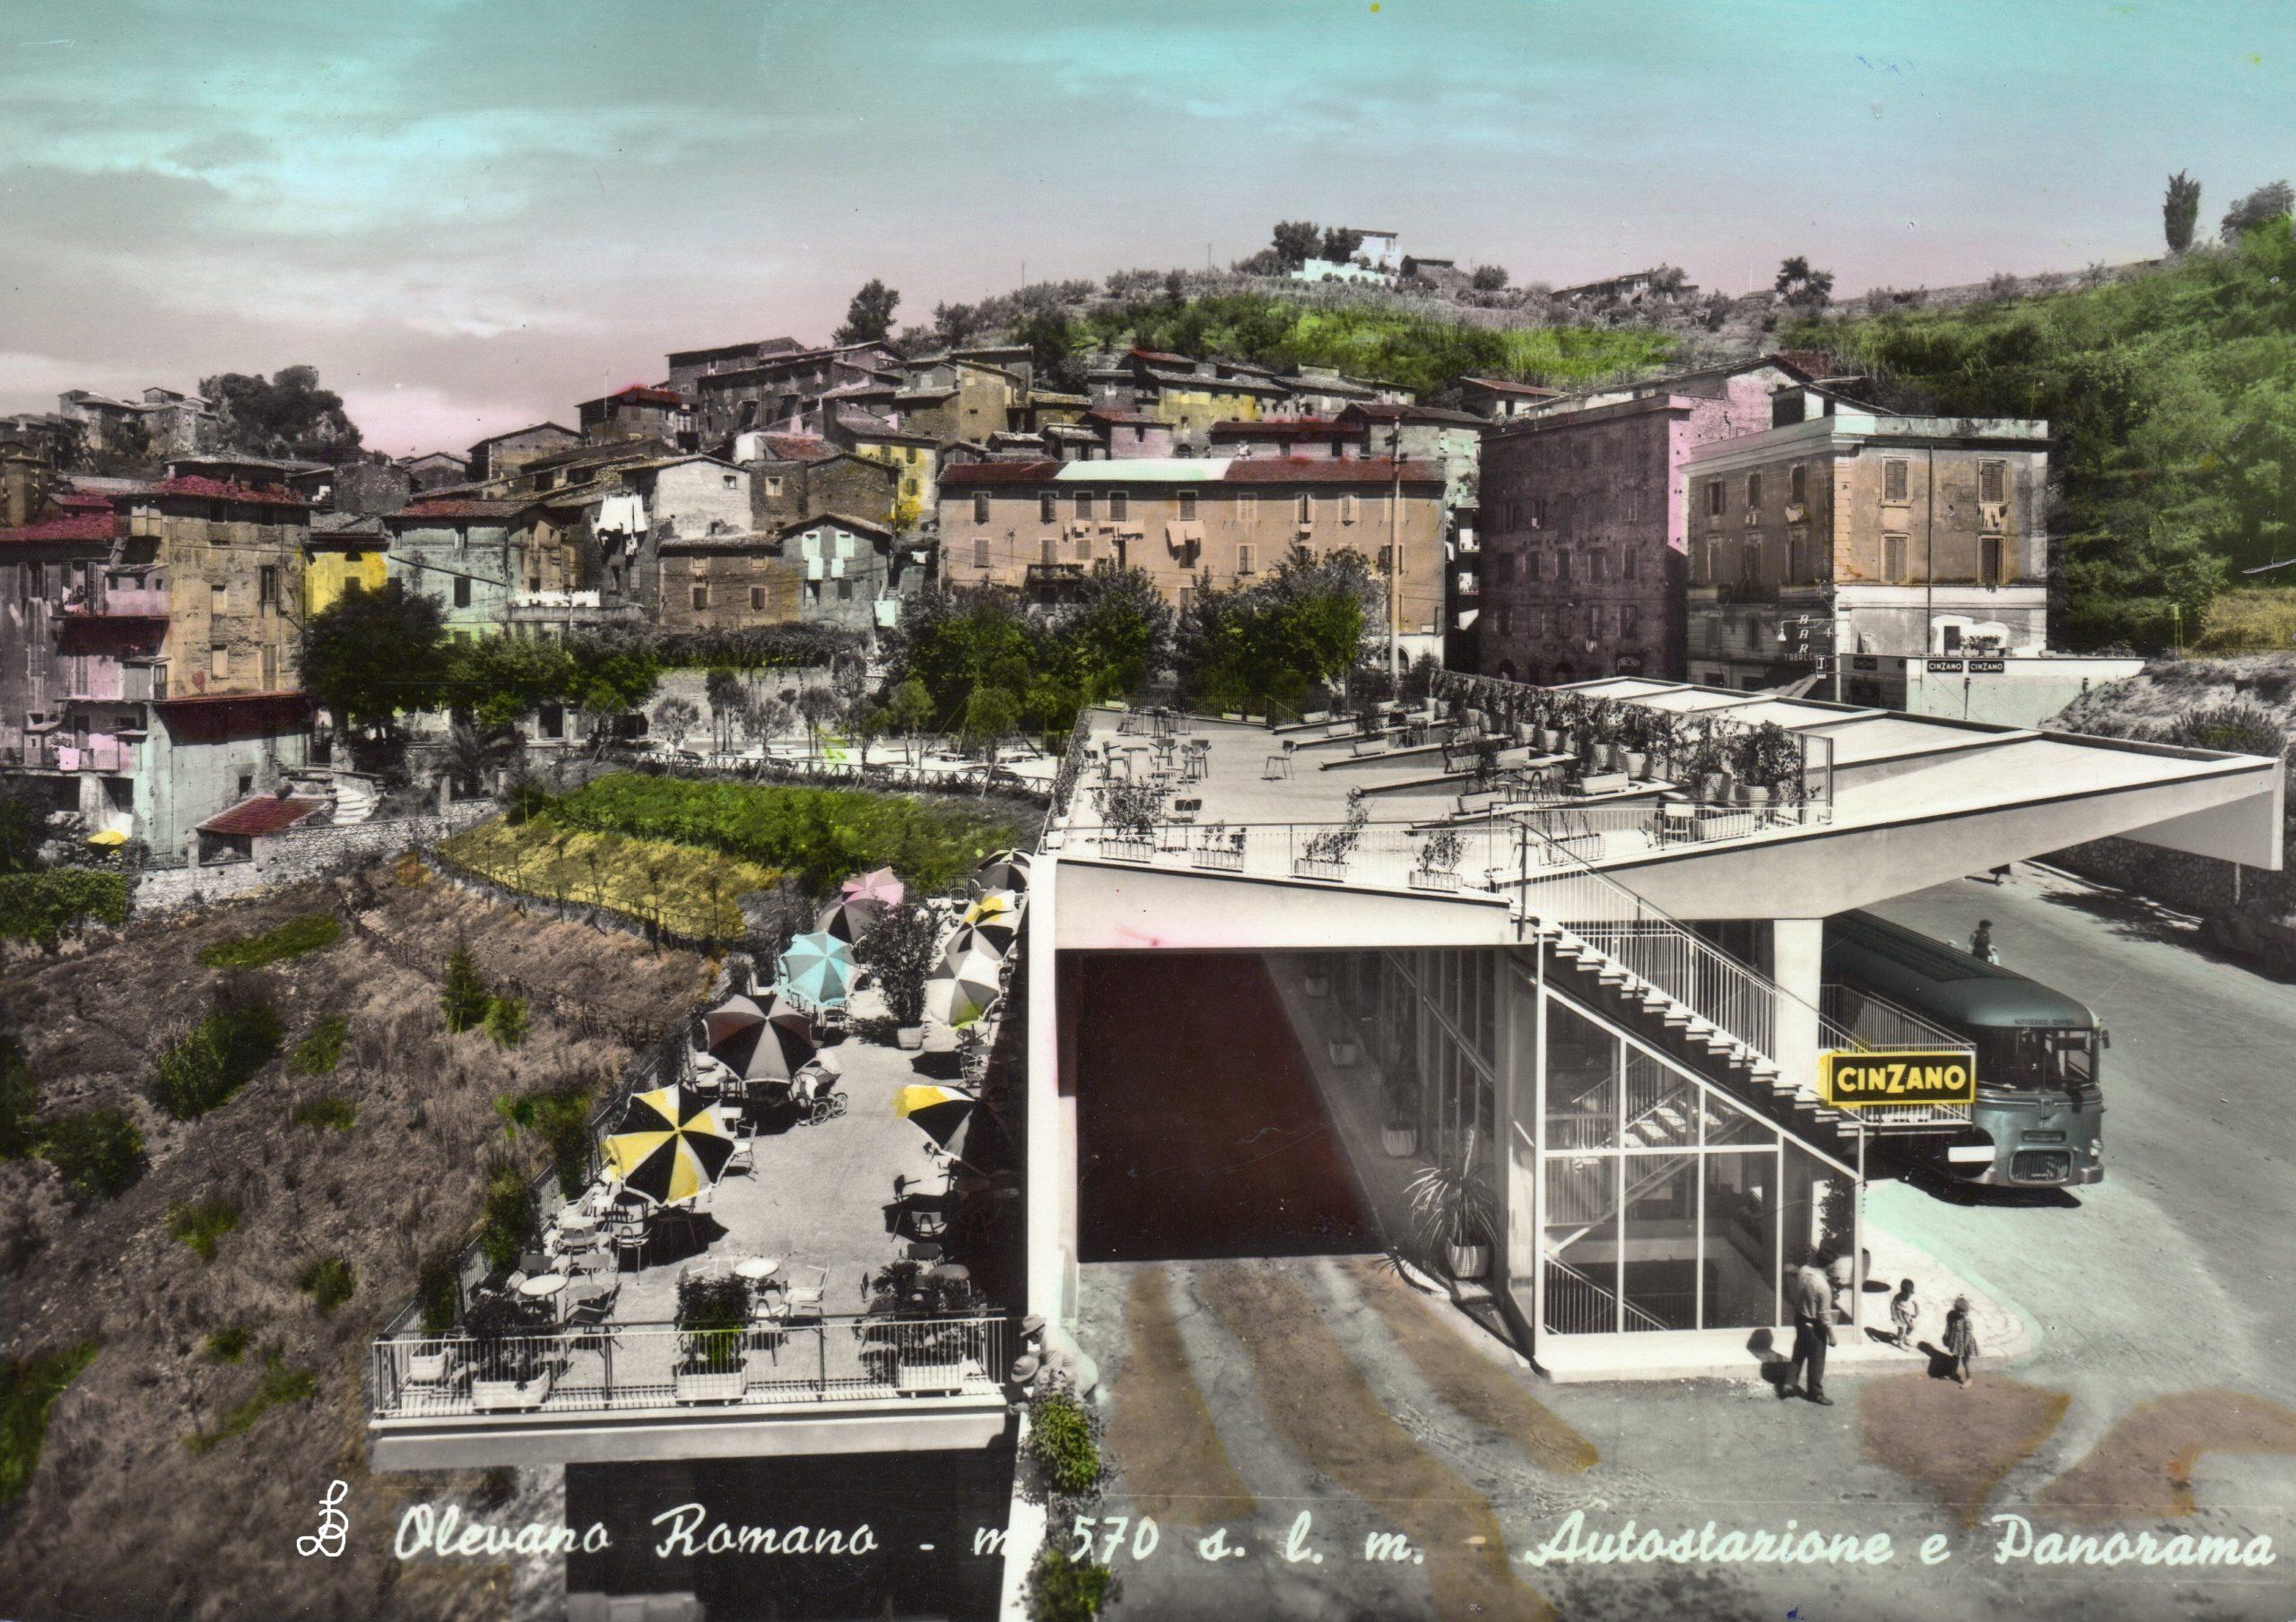 Busbahnhof von Olevano Romano